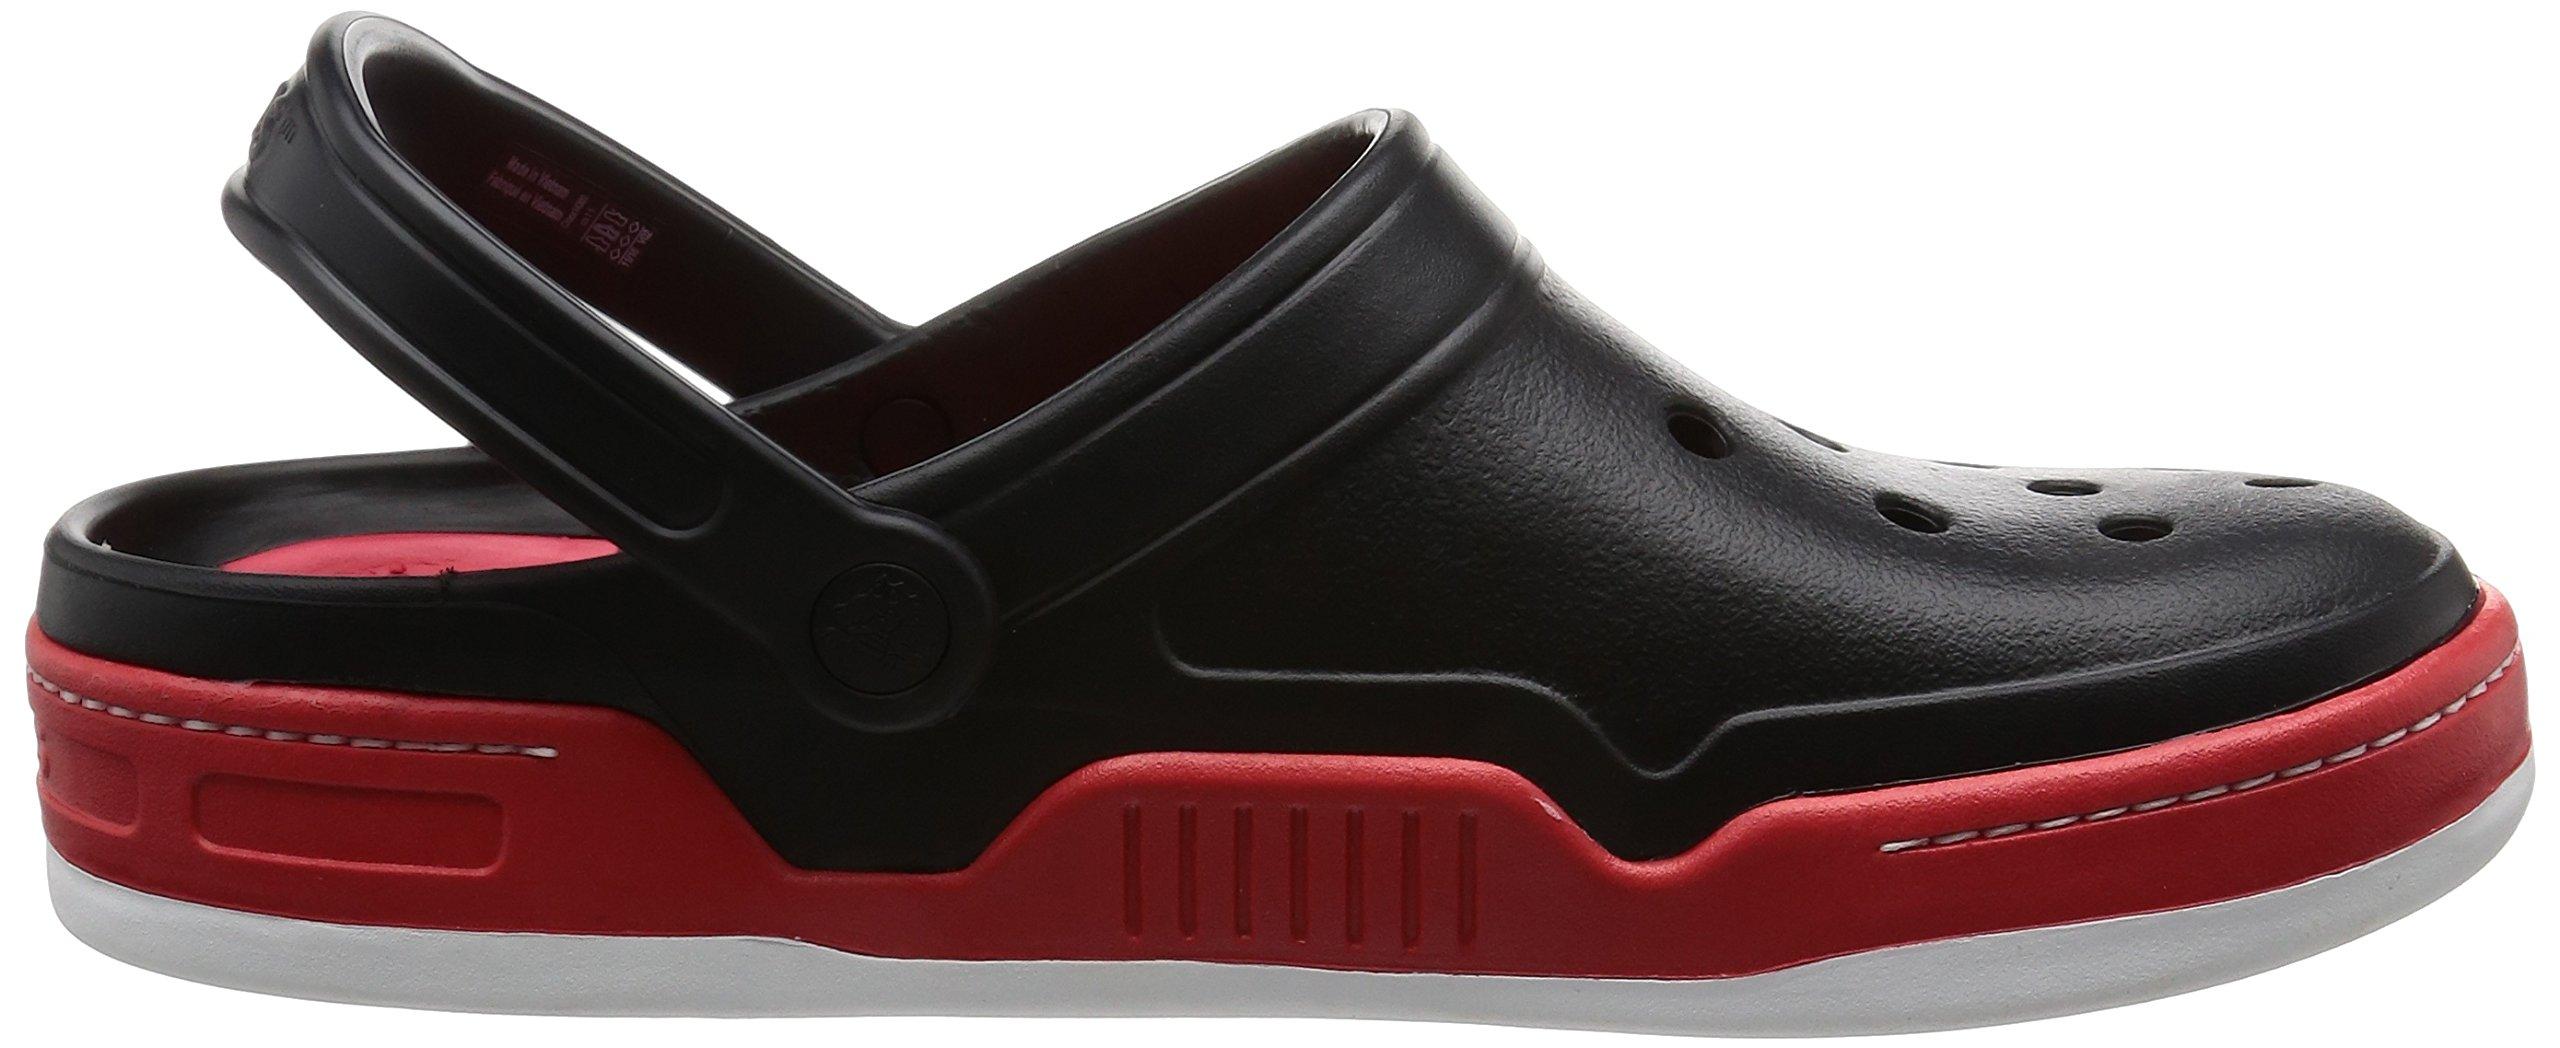 Crocs Men's 14300 Front Court Clog, Black/Red, 10 M US by Crocs (Image #7)